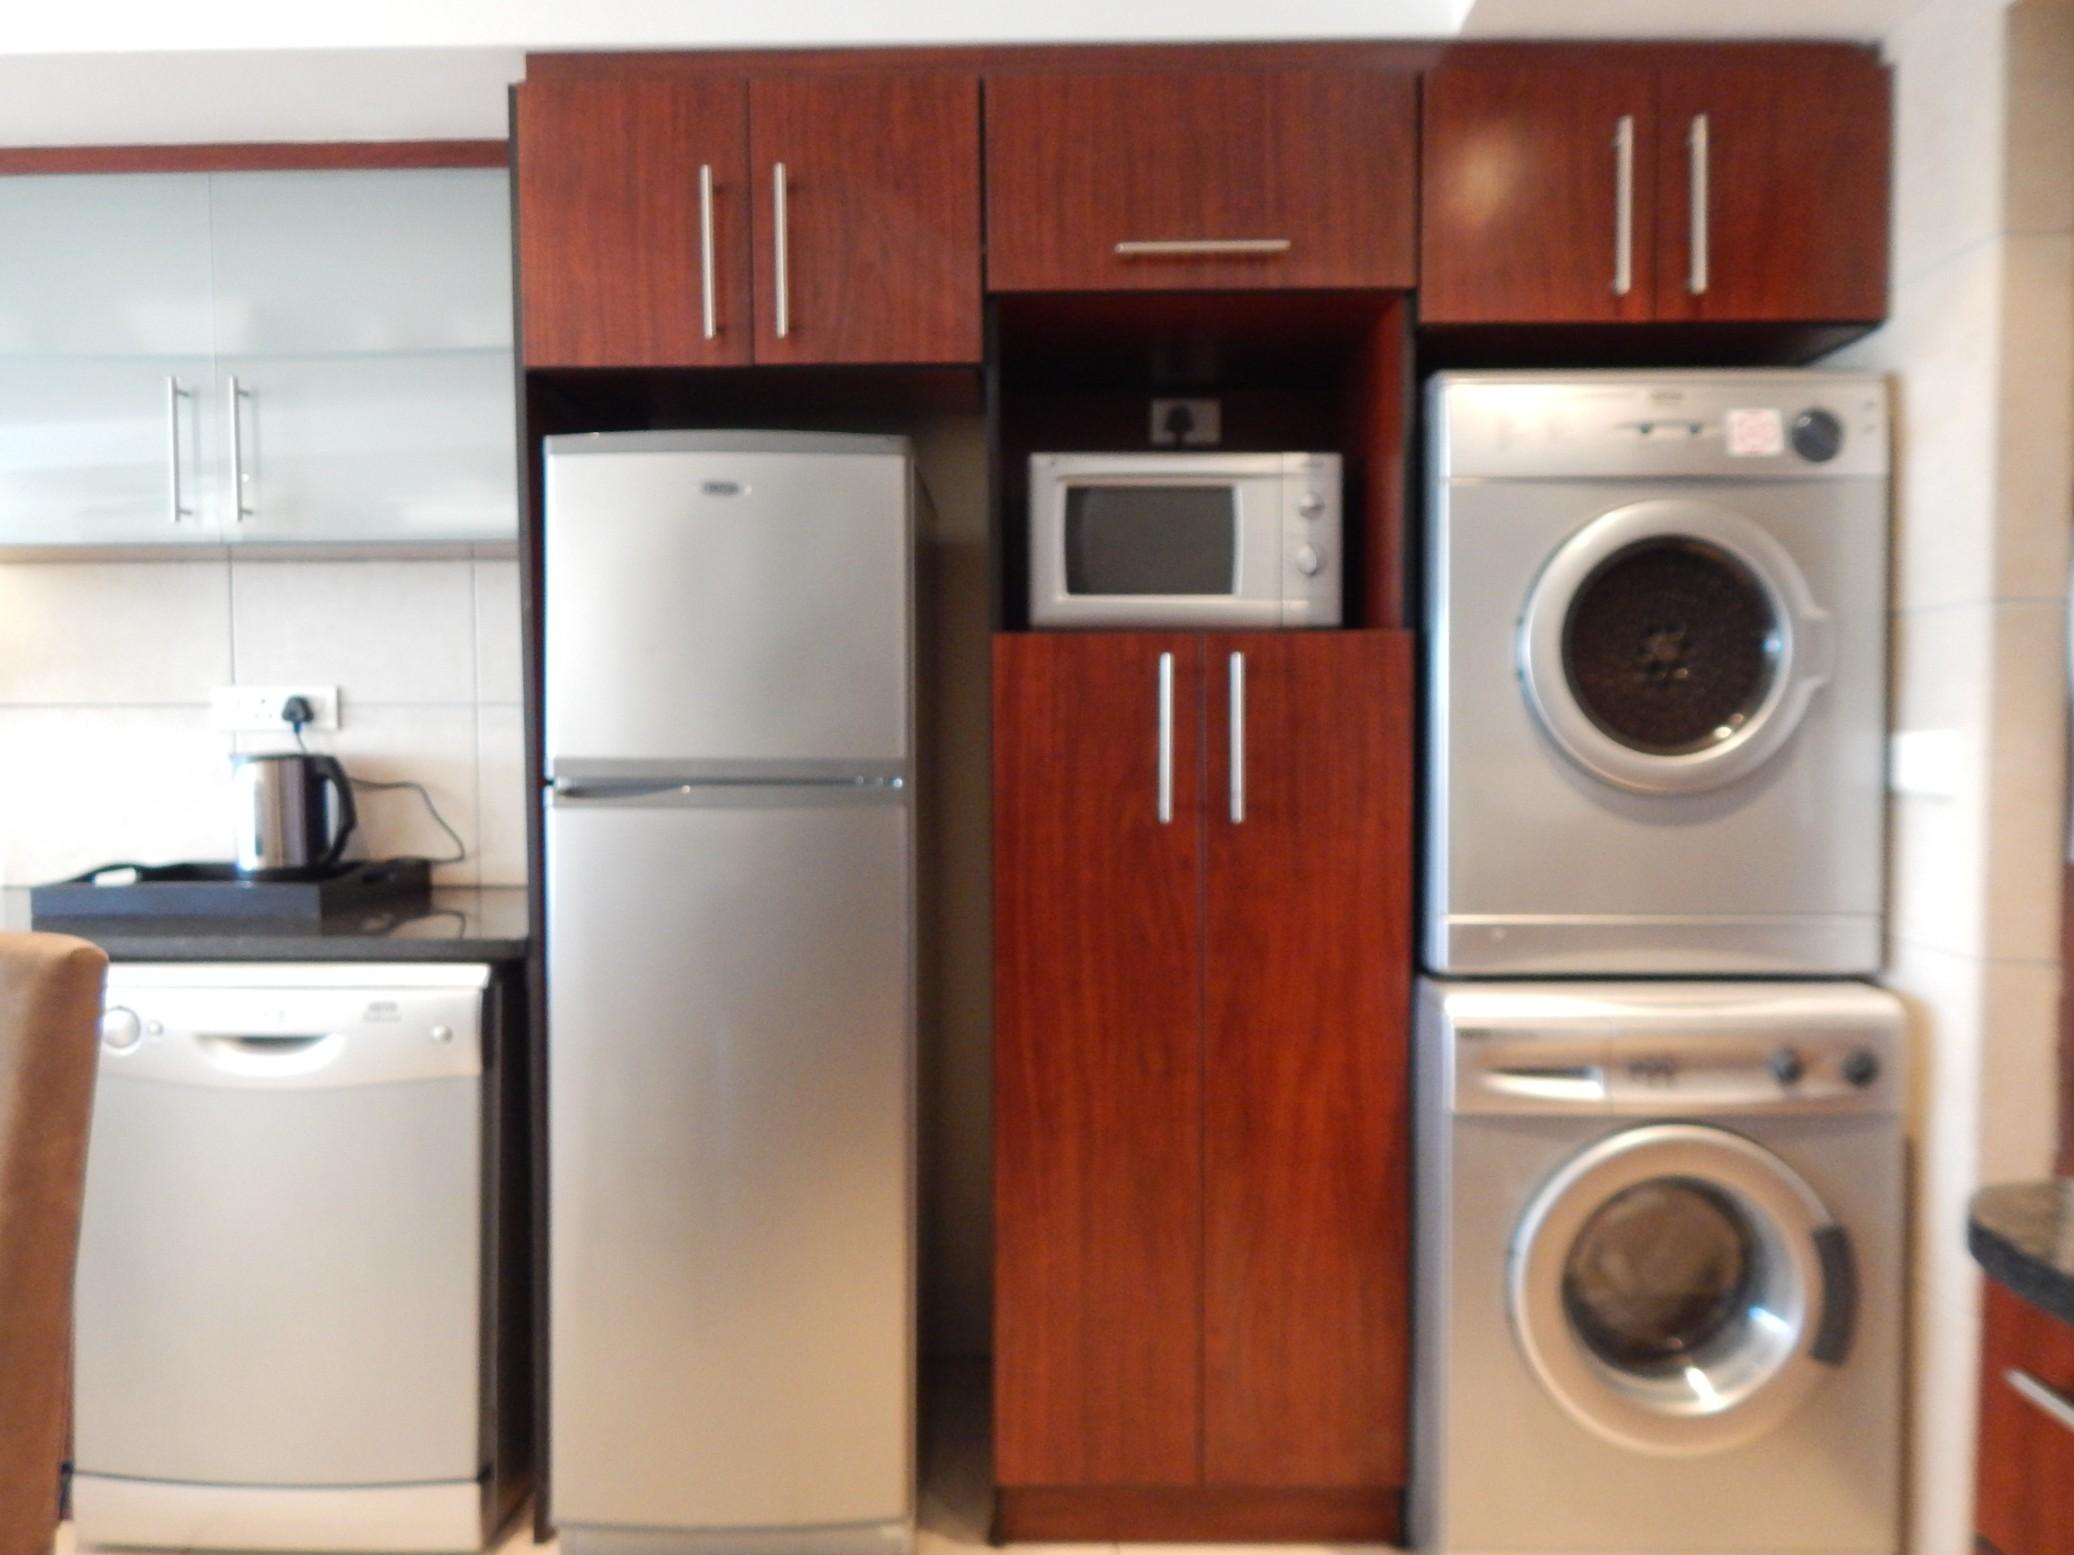 2 Bedroom Apartment for sale in De Bakke ENT0067862 : photo#15